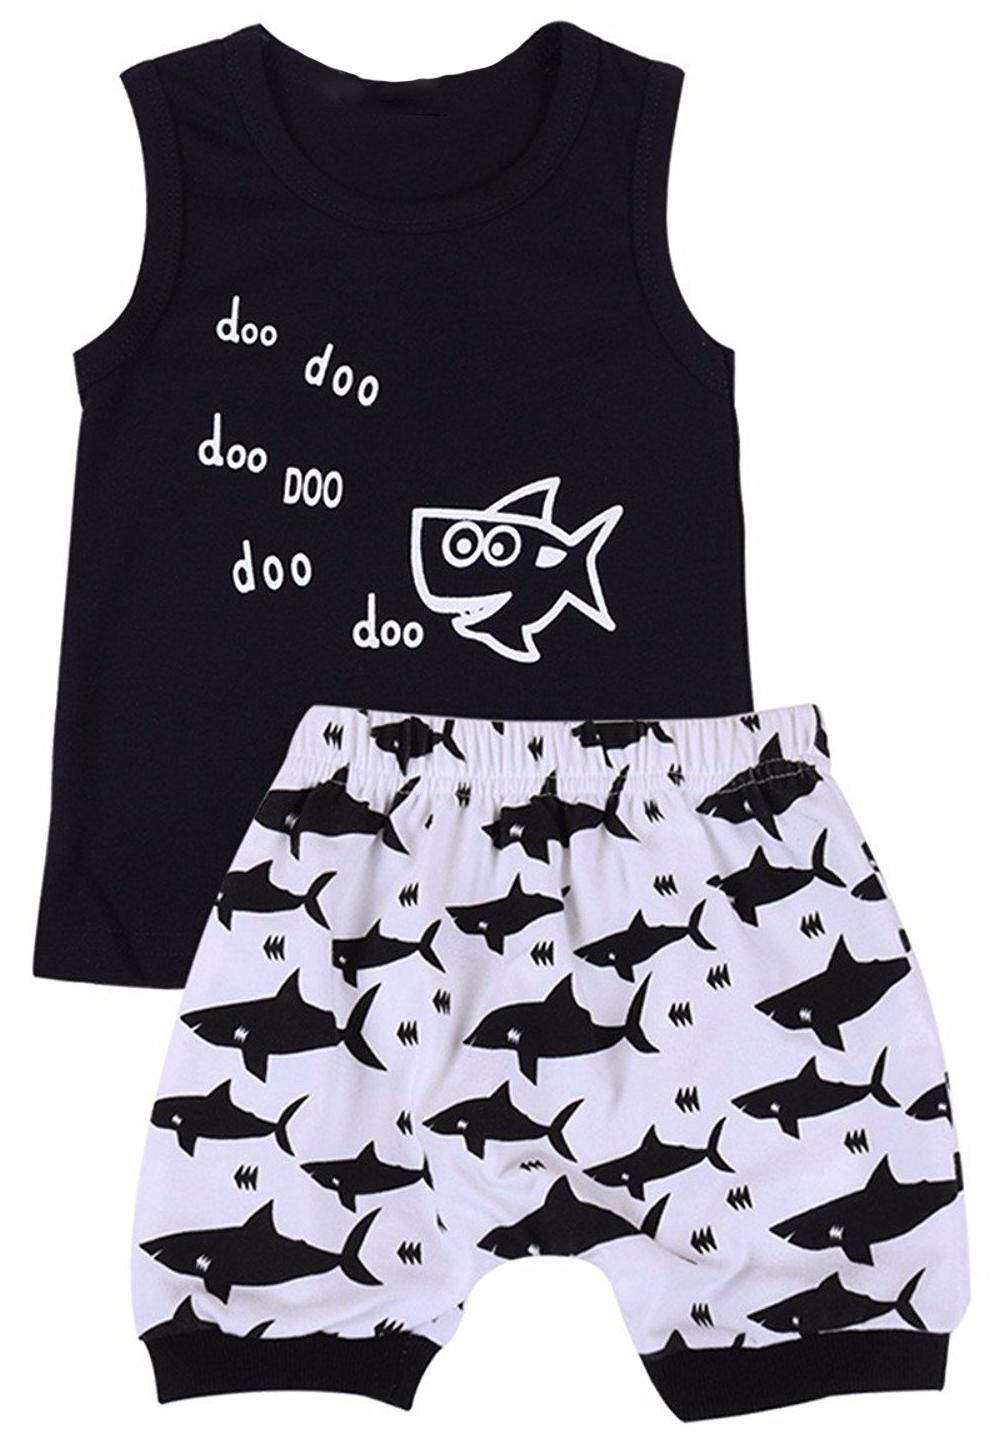 Toddler Kid Baby Shark Boys Outfits Cotton Tops T-Shirt Shorts Pants Clothes Set